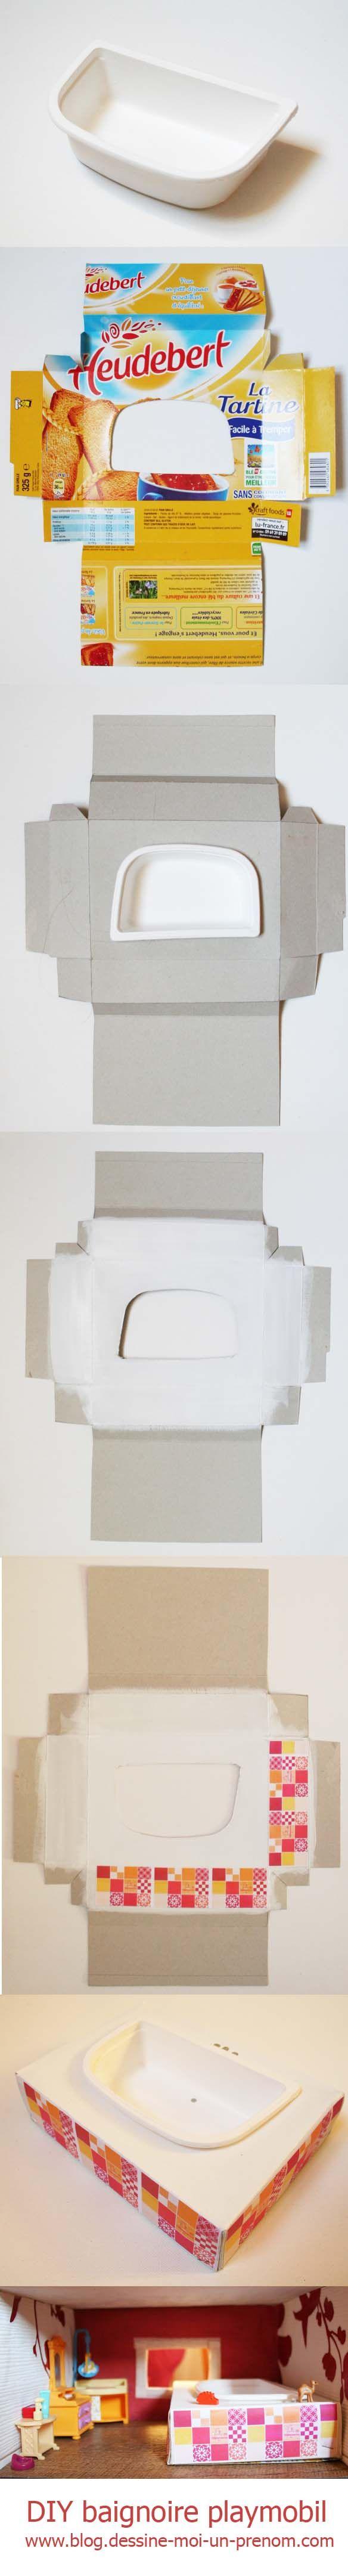 Salle De Bain Playmobil ~ tutoriel diy fabriquer salle de bains playmobil maisons de poup es